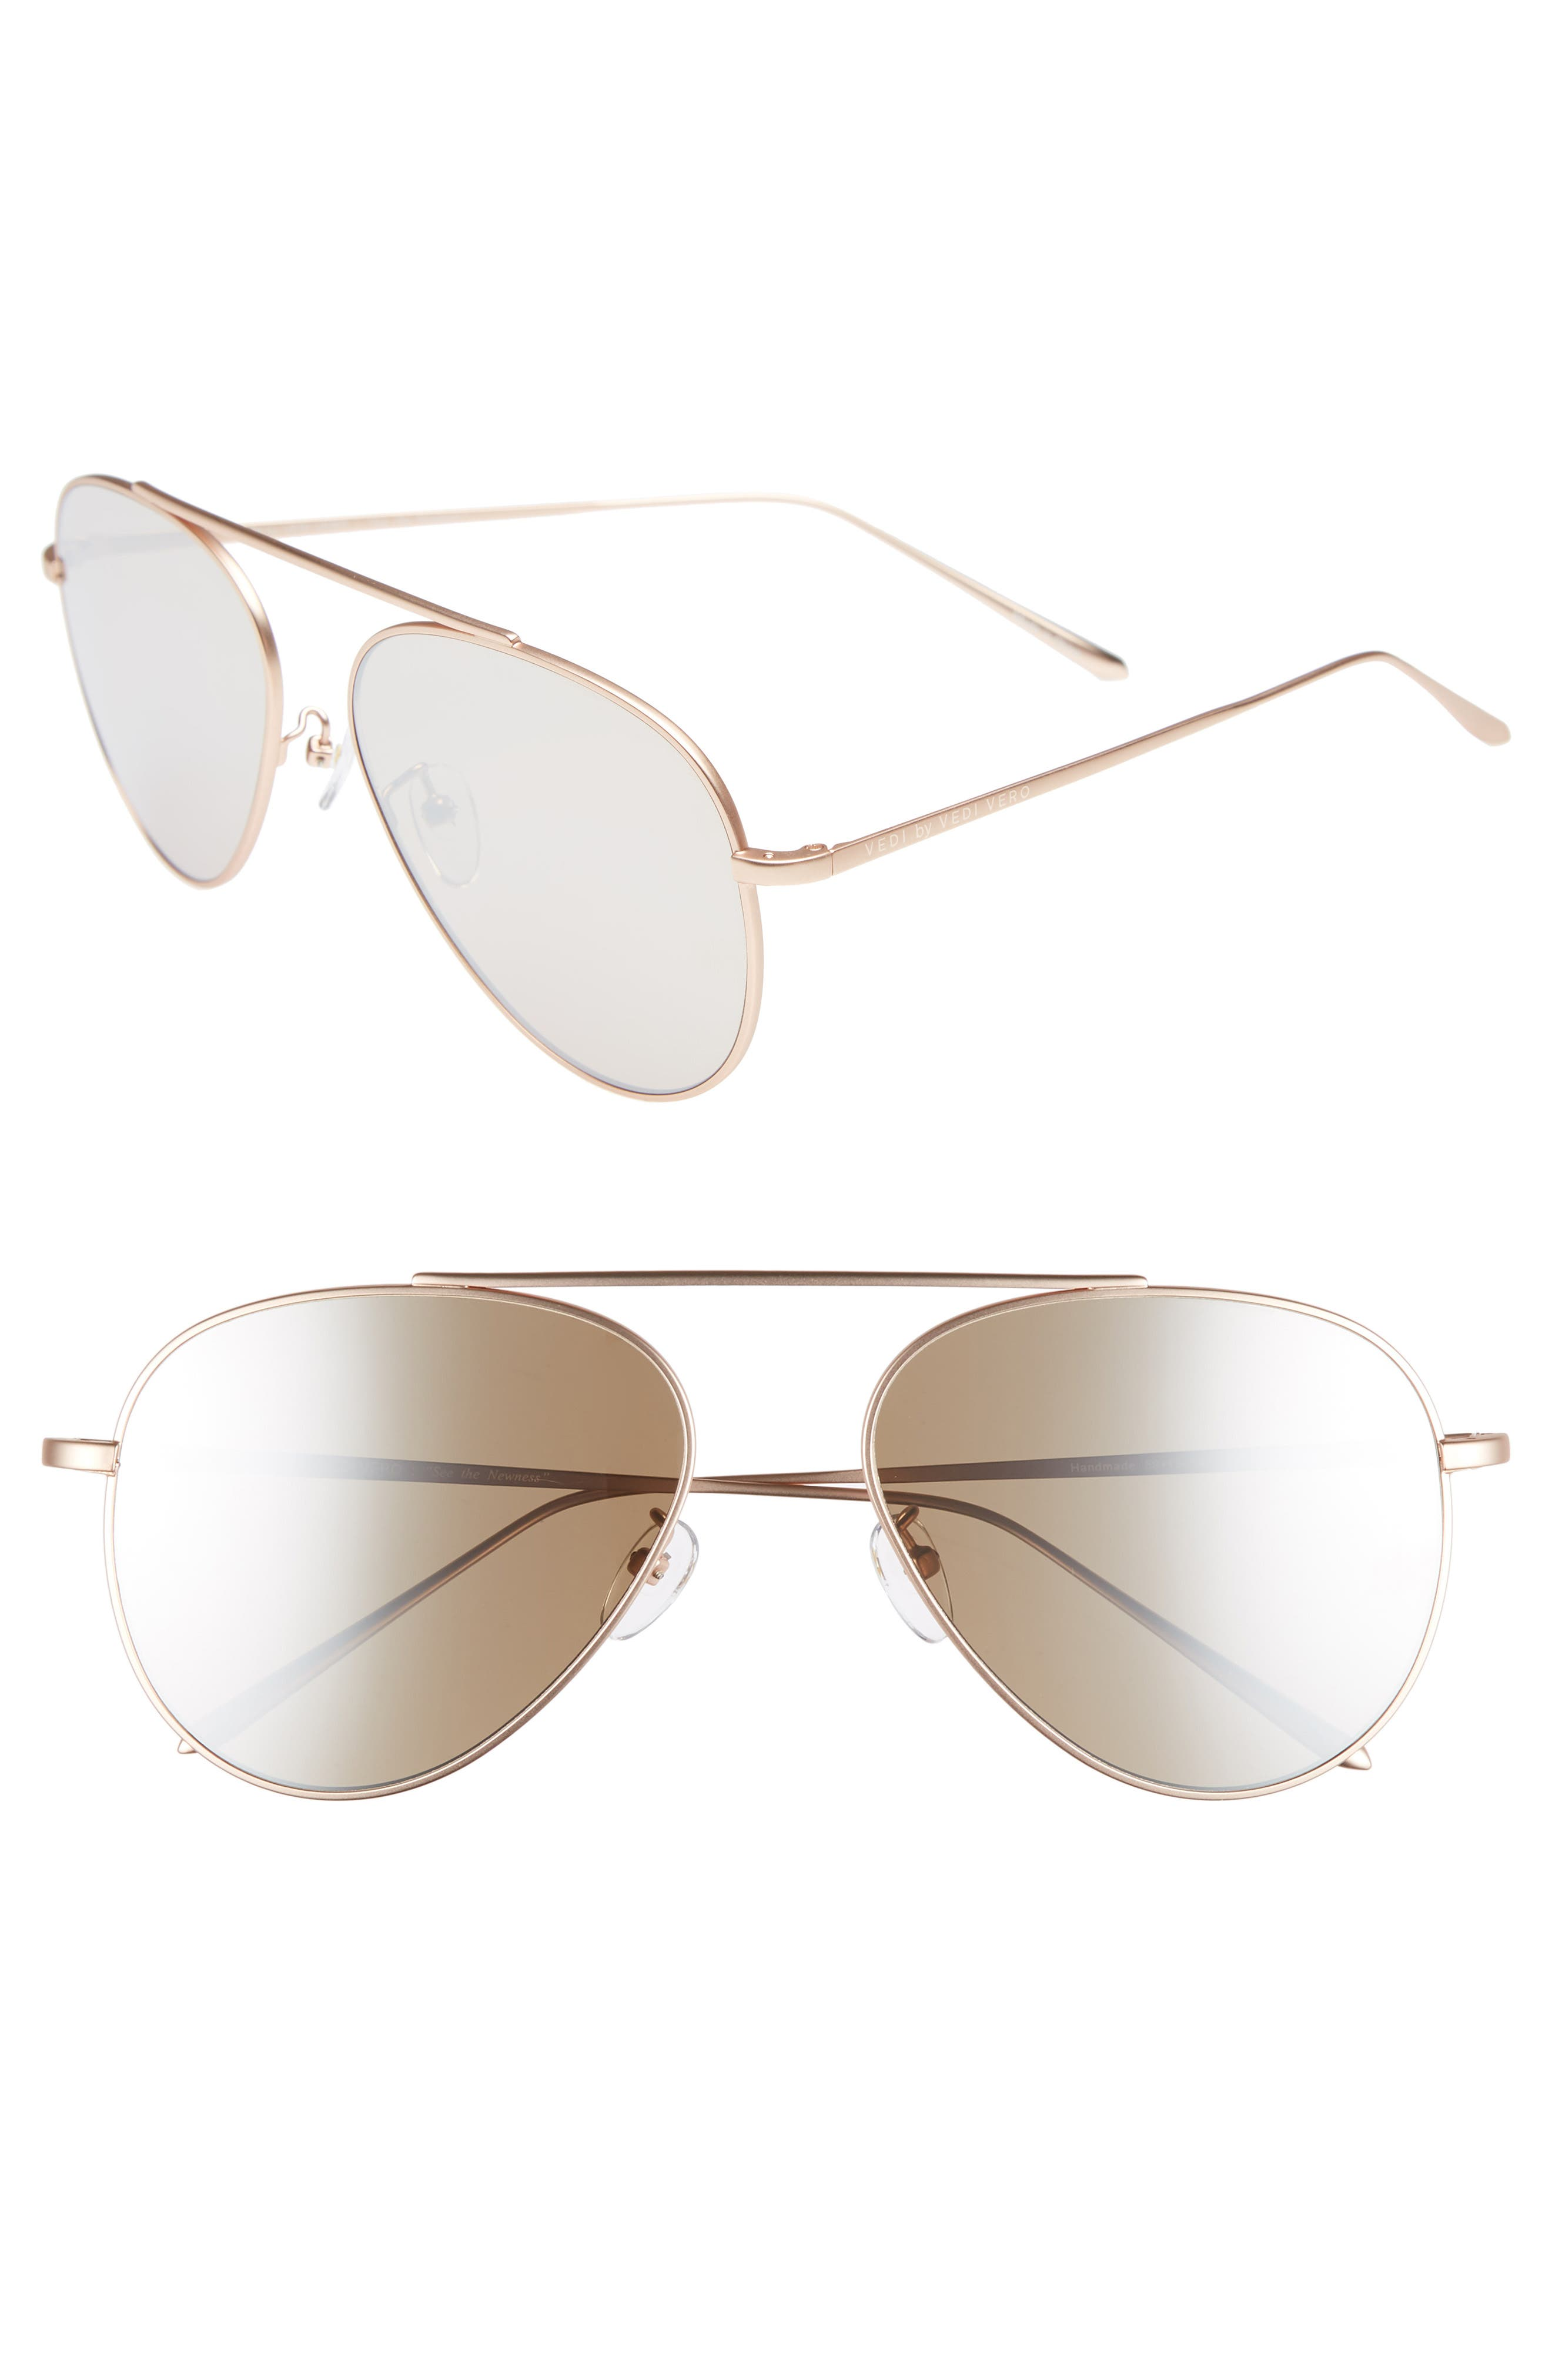 59mm Metal Aviator Sunglasses,                         Main,                         color, ROSE GOLD/GOLD MIRROR